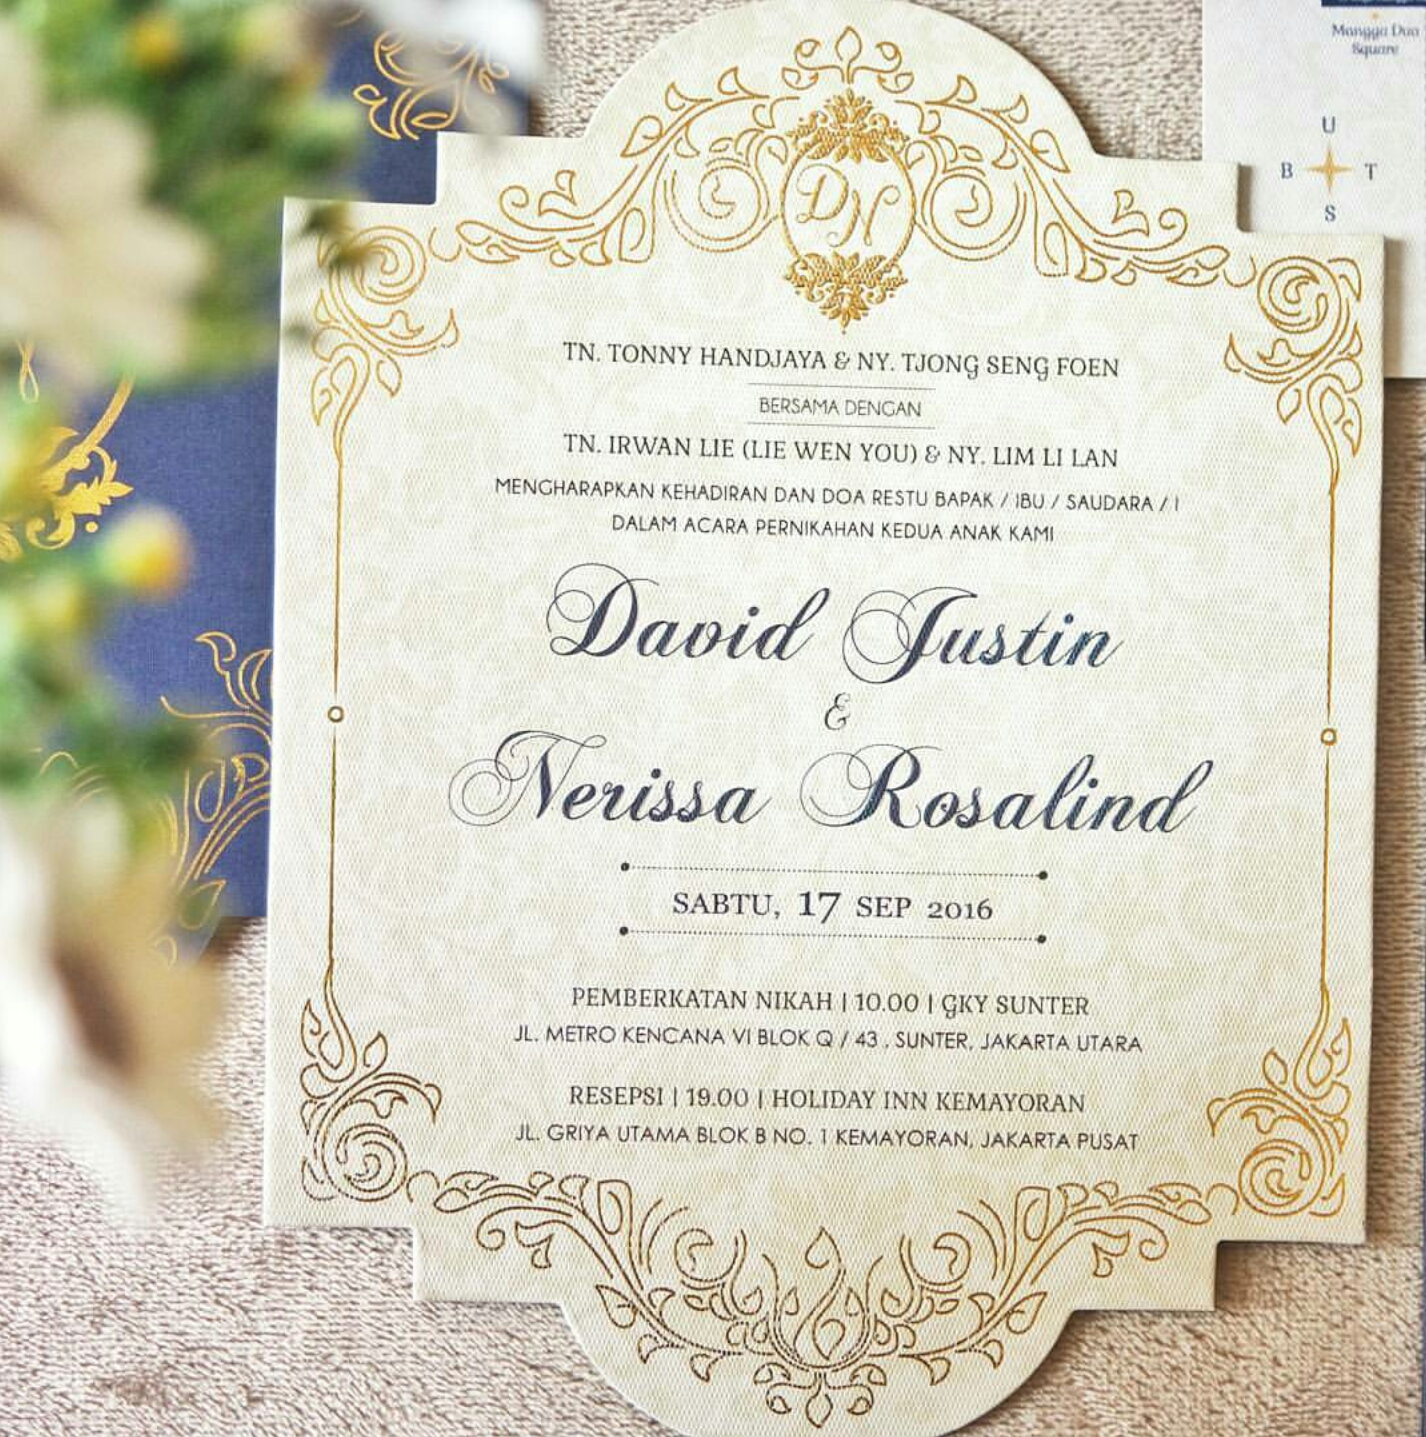 David nerissa wedding invitation by nitartwork design printing david nerissa wedding invitation by nitartwork design printing bridestory stopboris Images